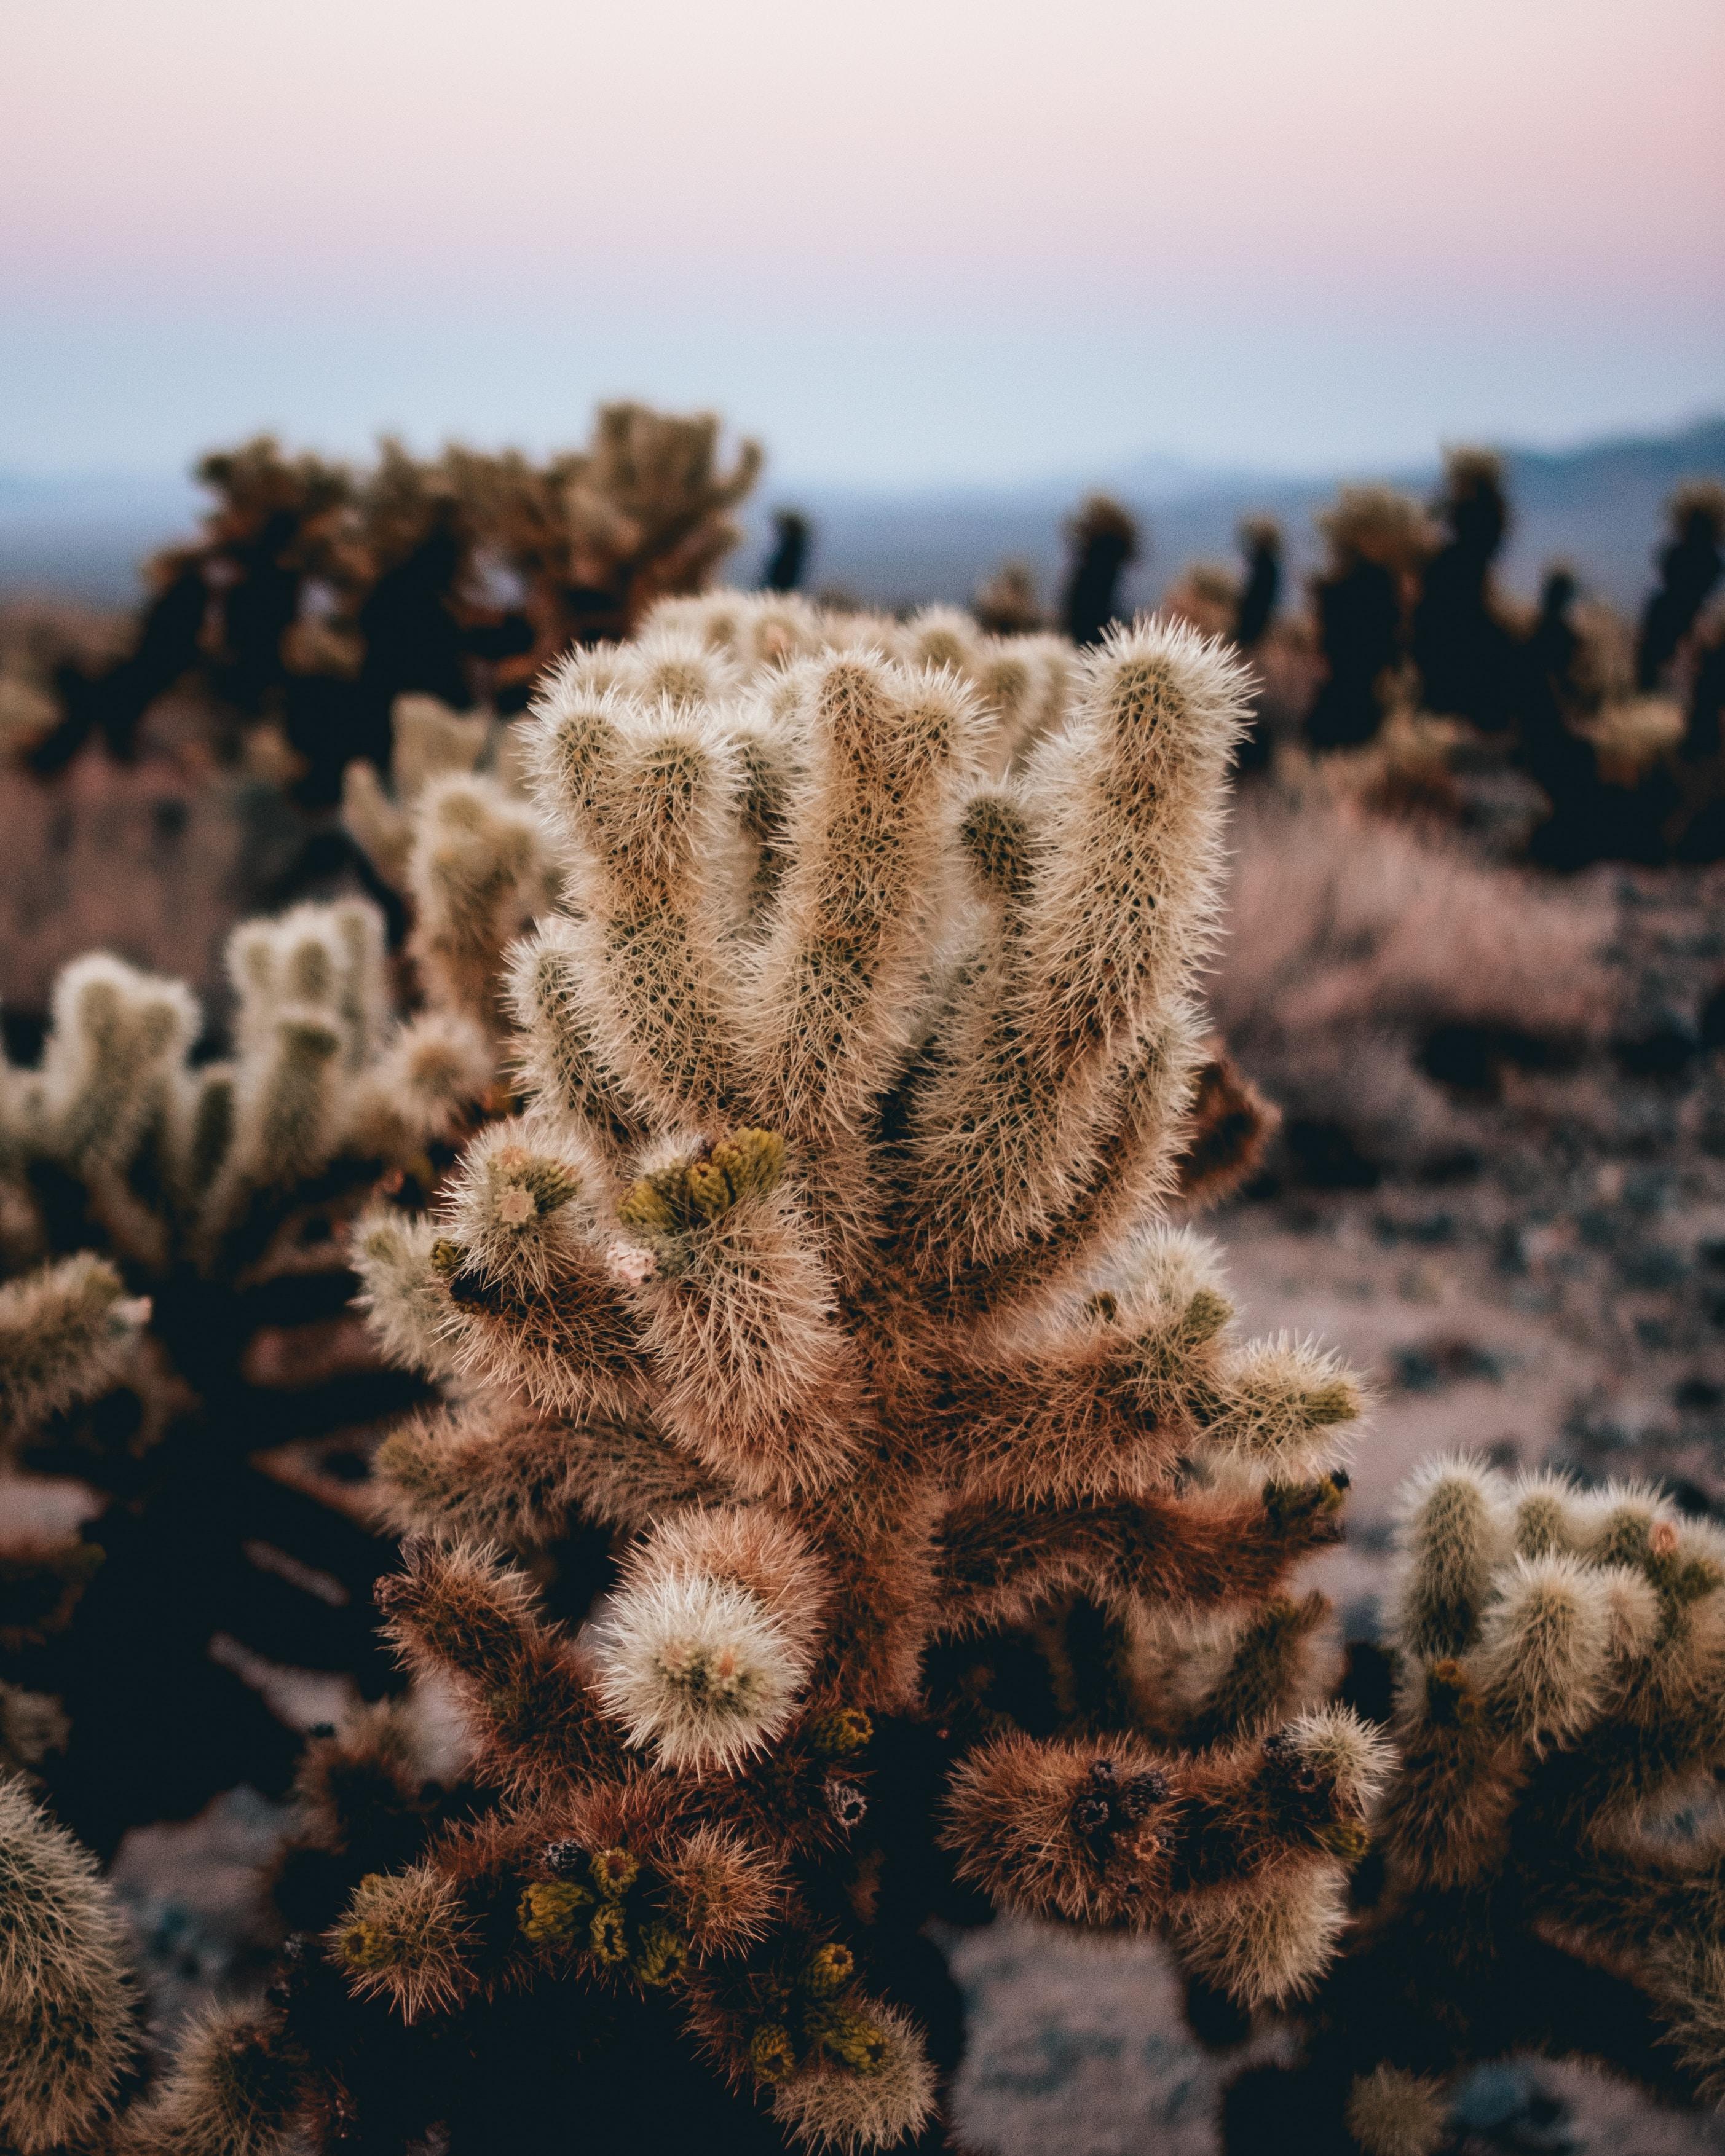 tilt shift lens photography of green cactus